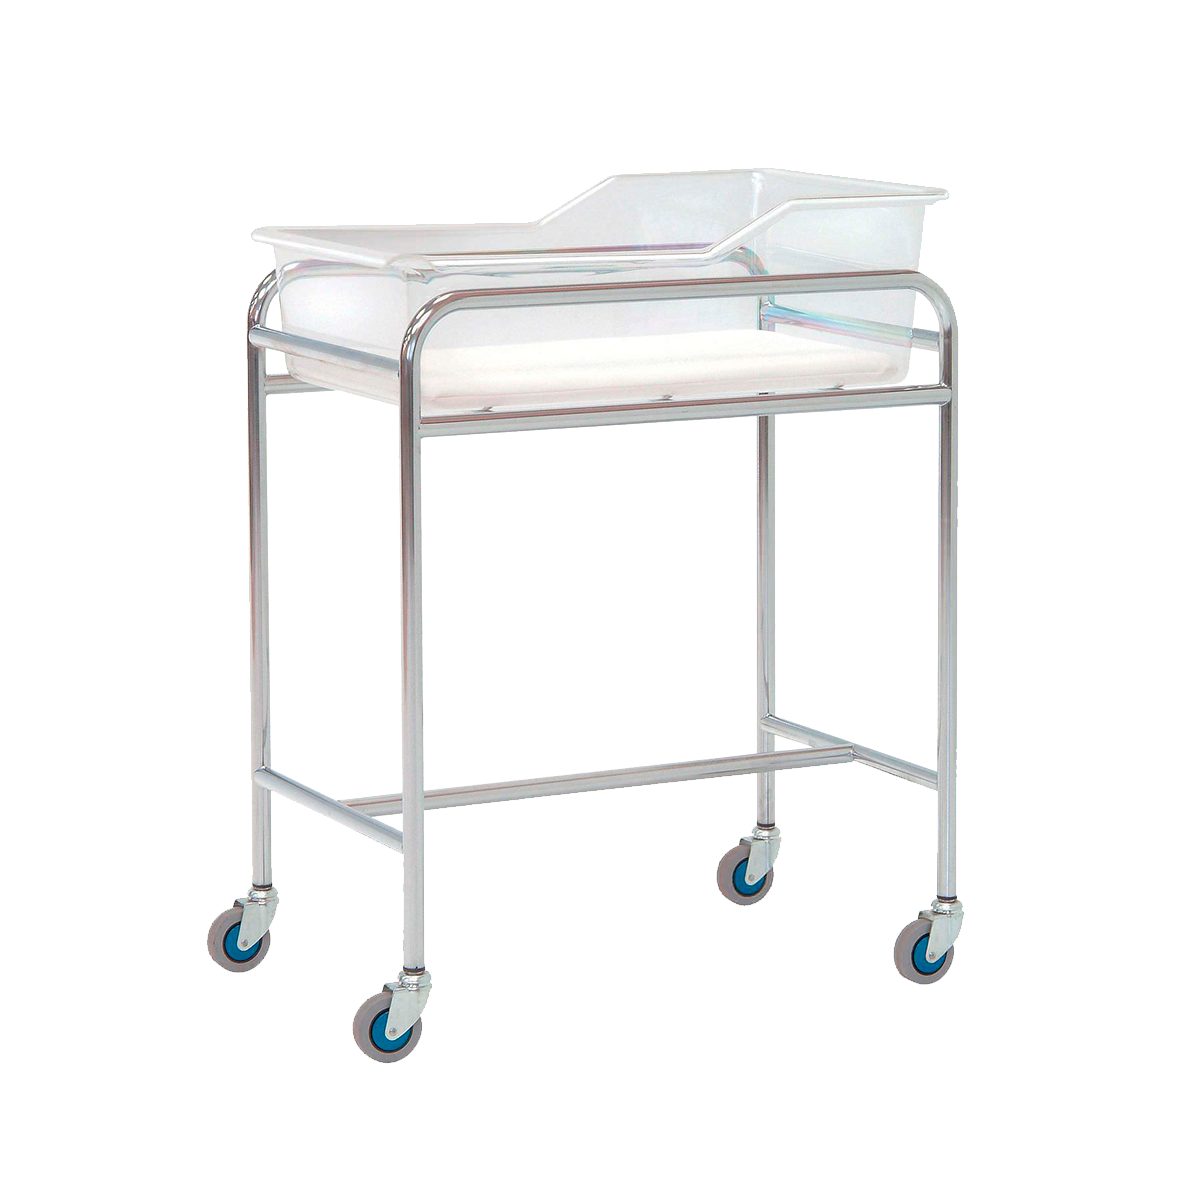 Hospital bassinet